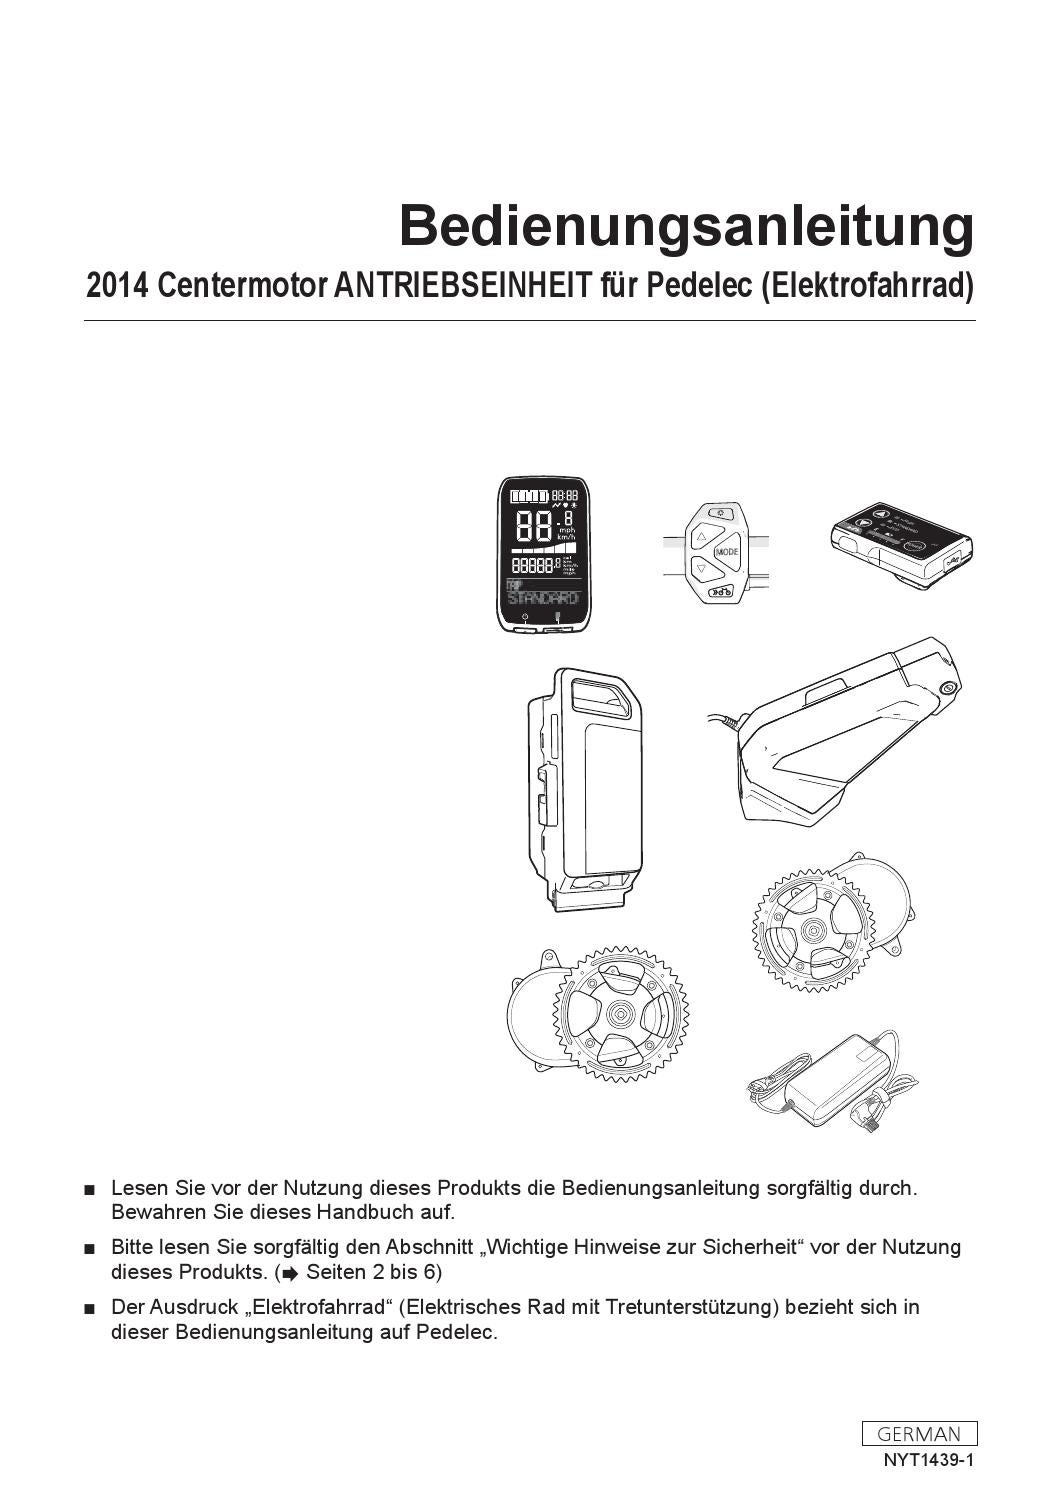 Bedienungsanleitung Panasonic FLYER 2014 by FAHRRADIES ...